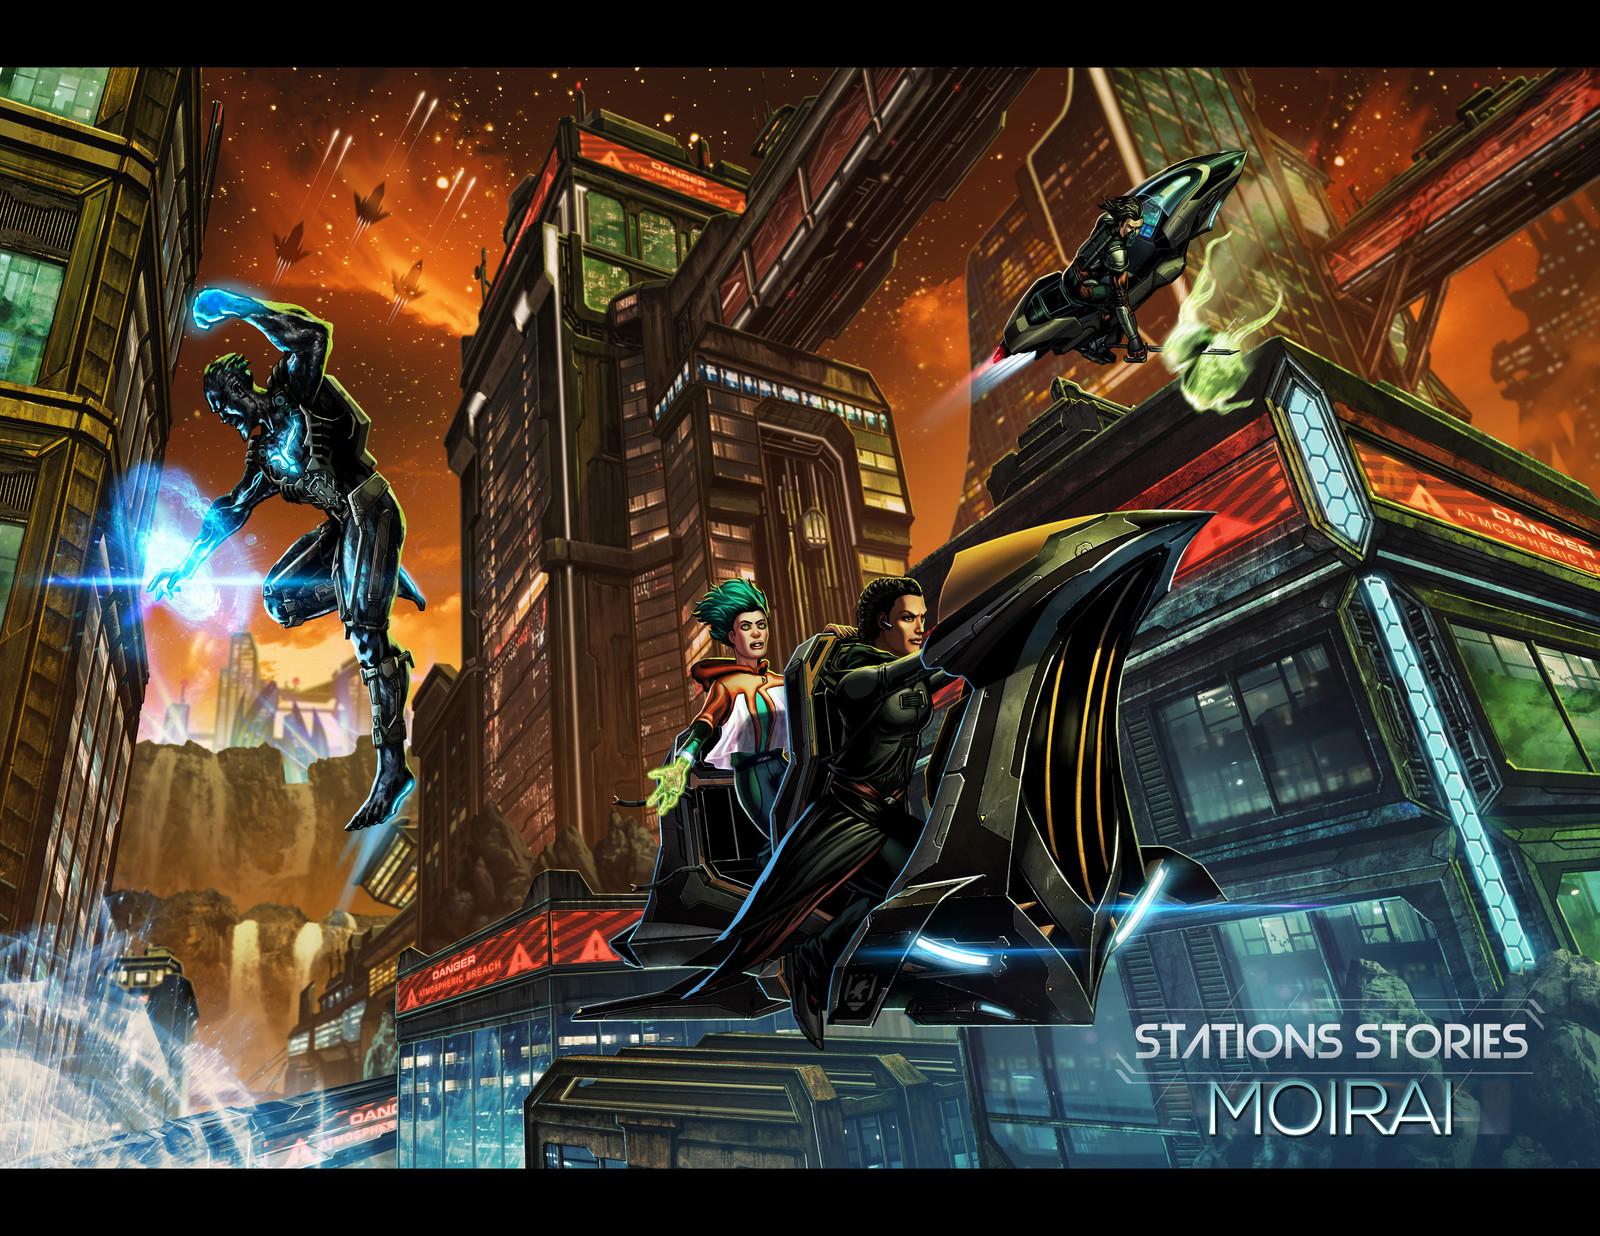 Station Stories - Moirai - Teaser Trailer and Process